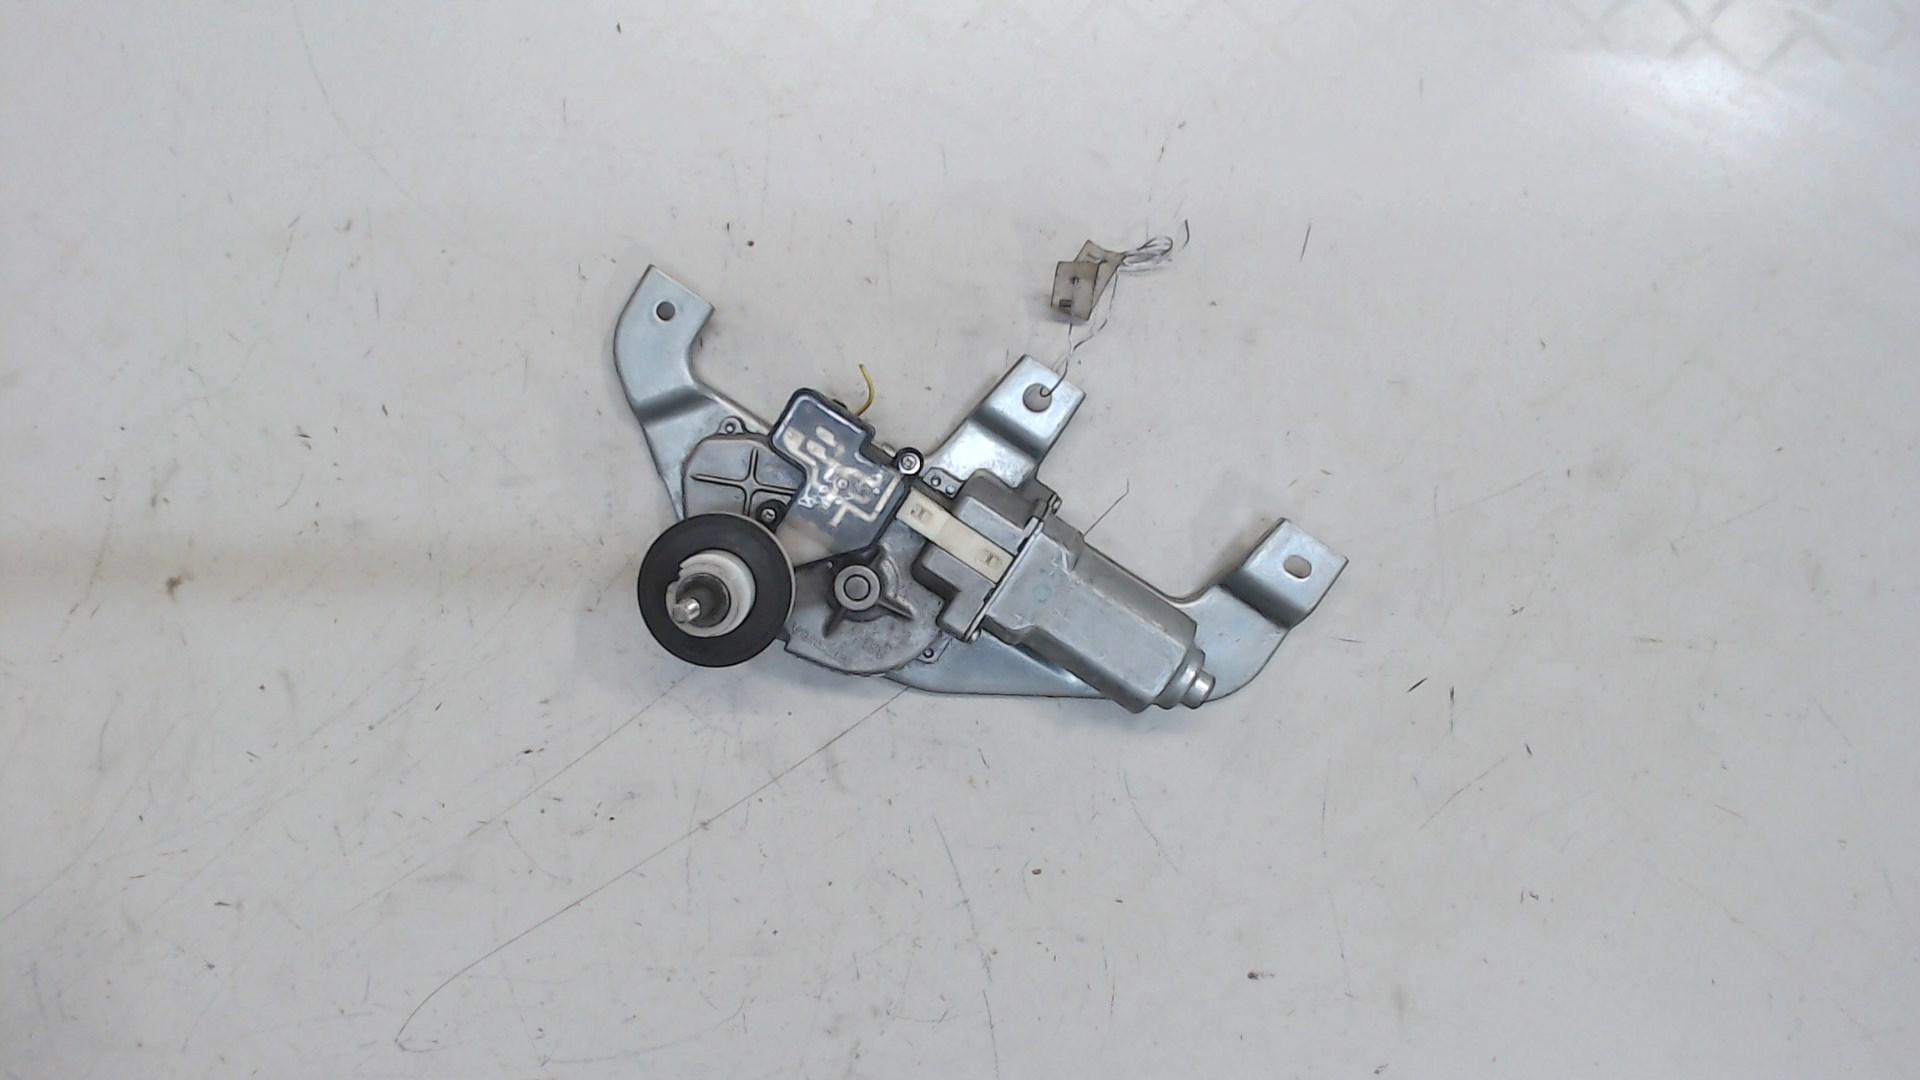 Моторчик заднего стеклоочистителя (дворника) Suzuki Swift 3